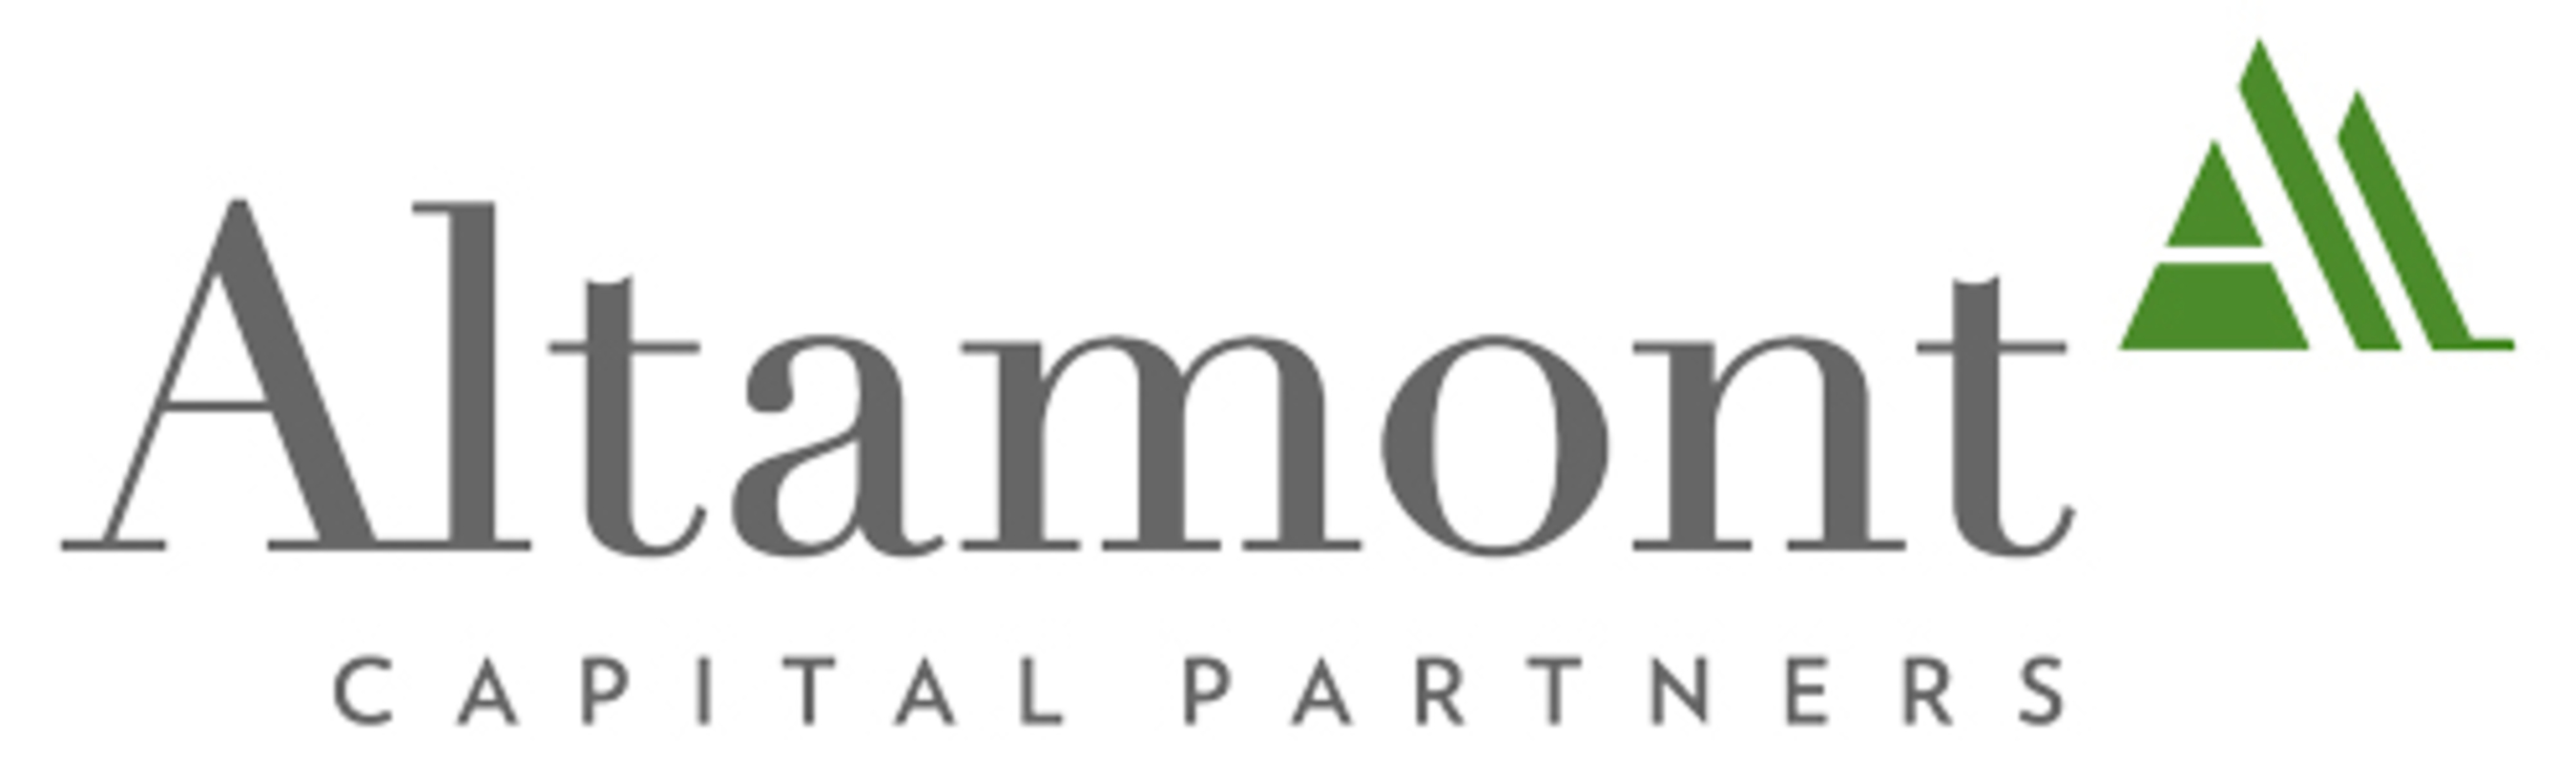 Altamont Capital Partners logo.